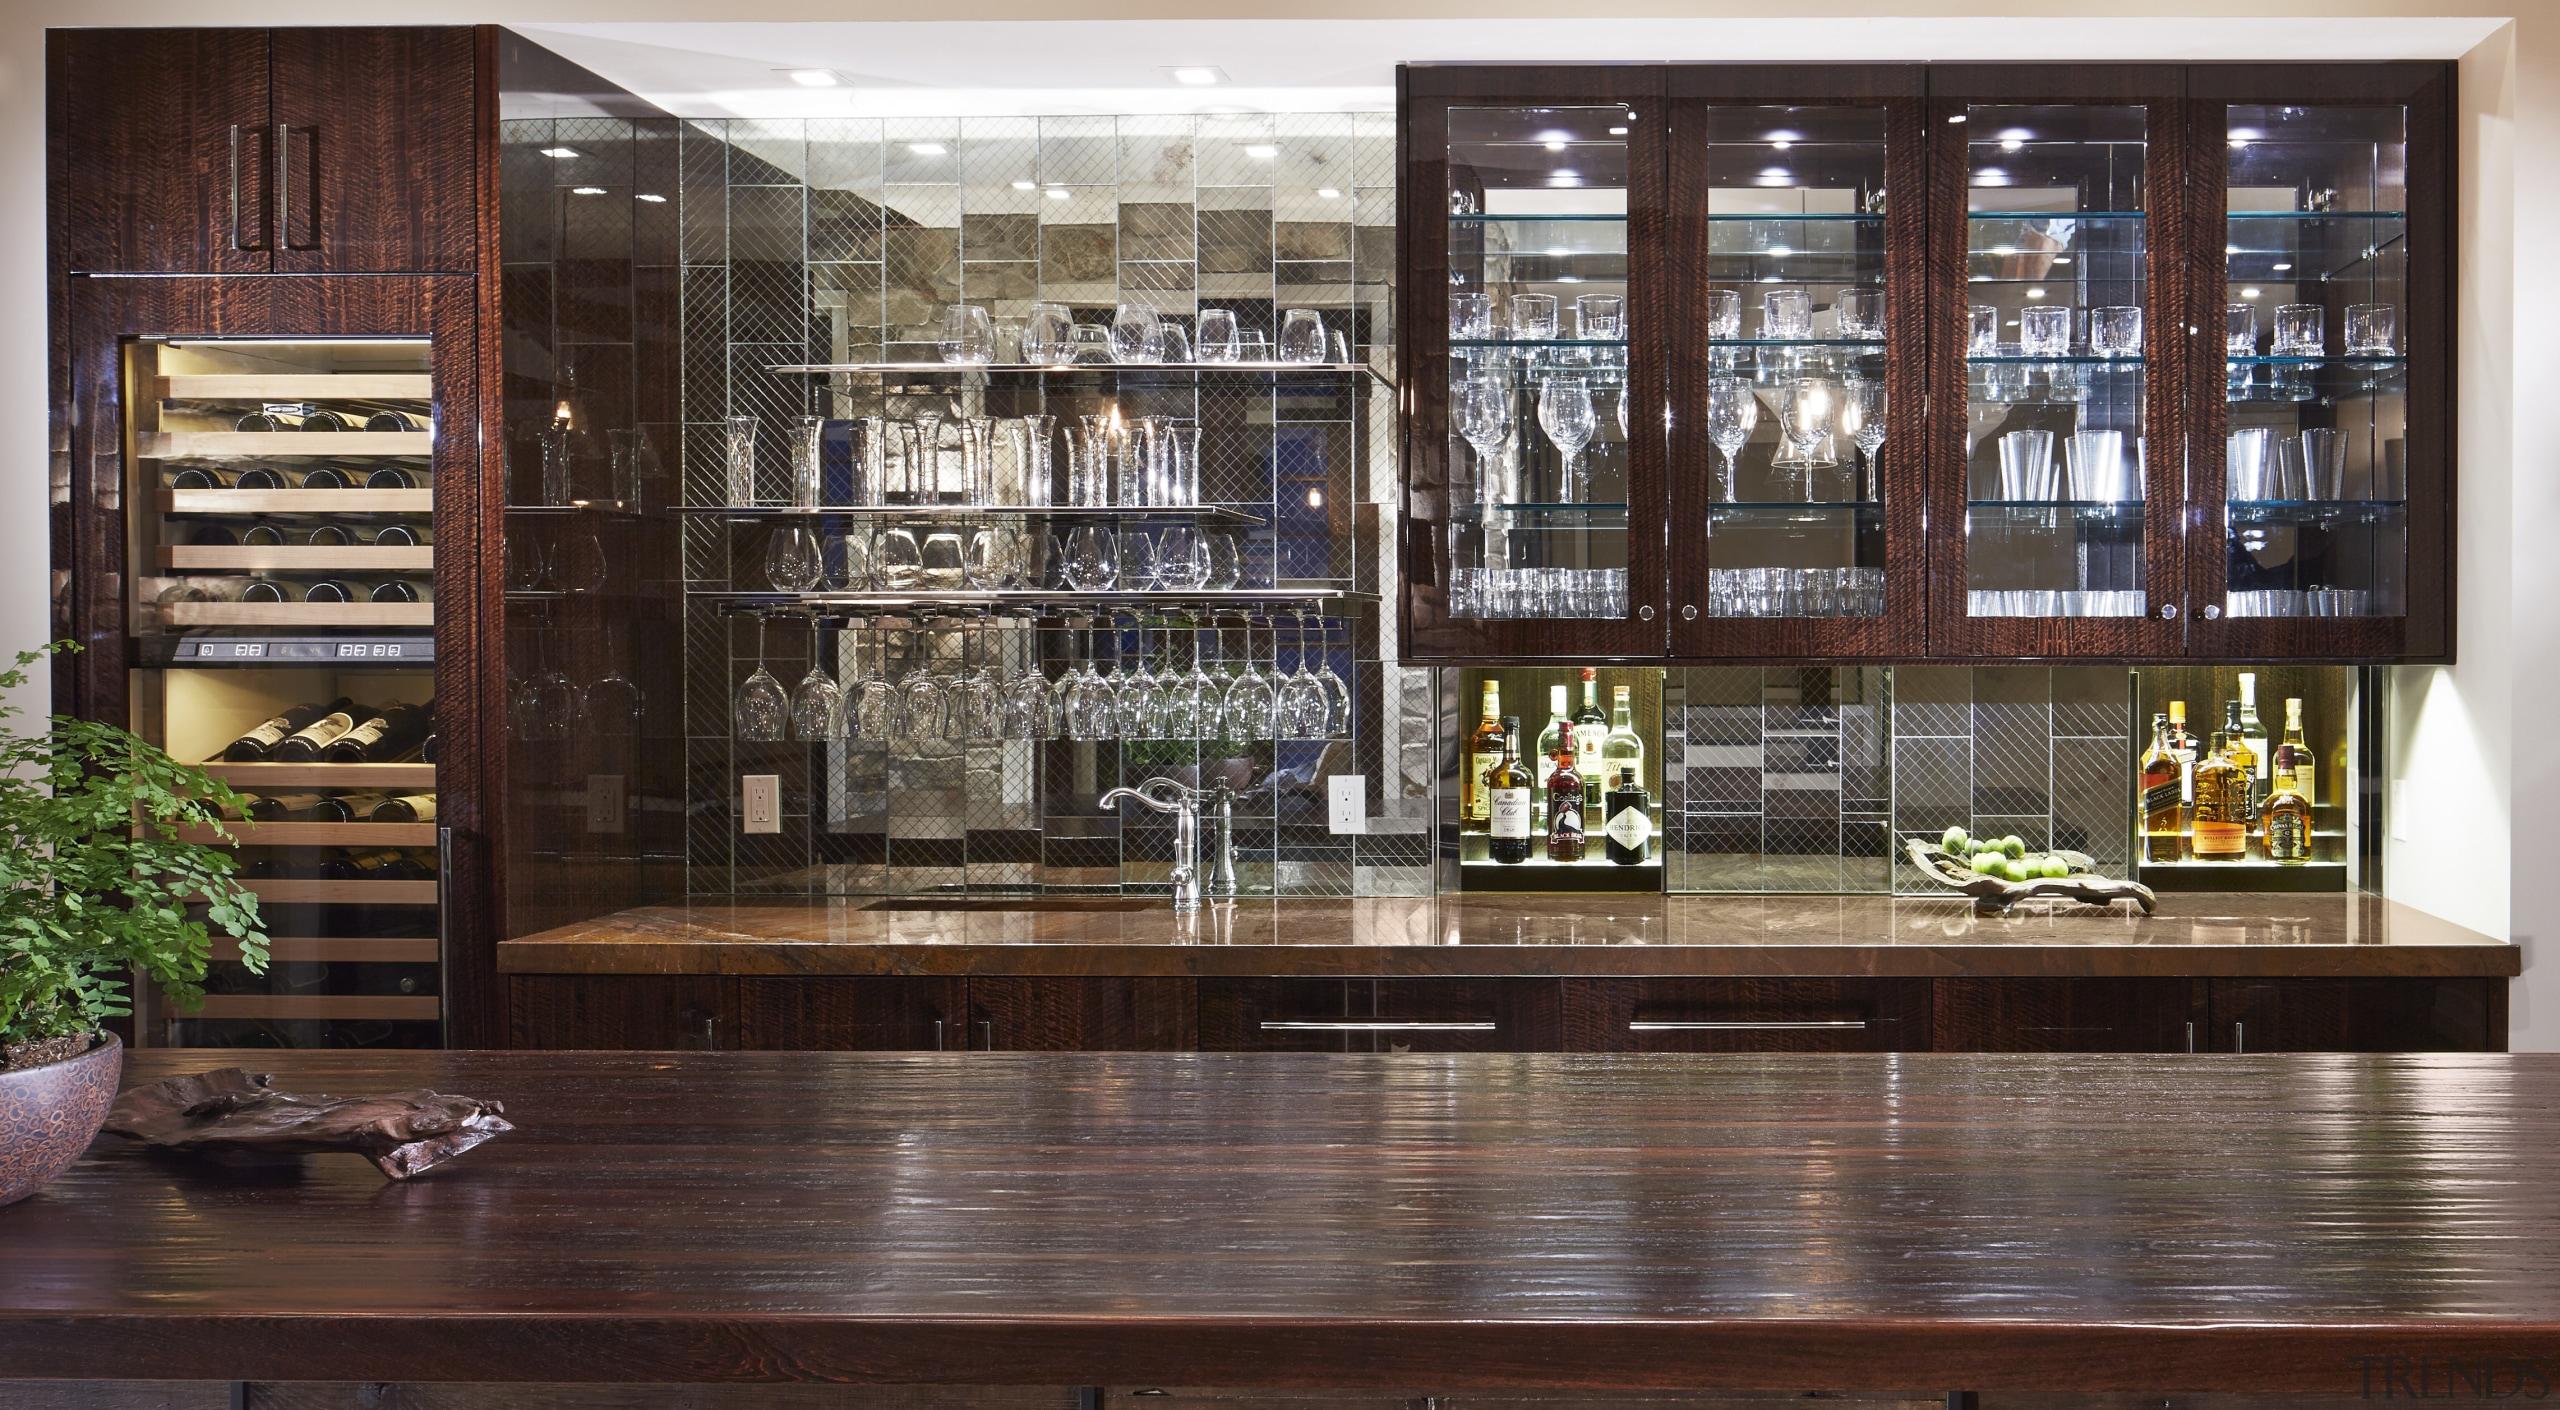 Mick De Giulio also designed this bar alongside bookcase, cabinetry, furniture, interior design, liquor store, lobby, shelving, red